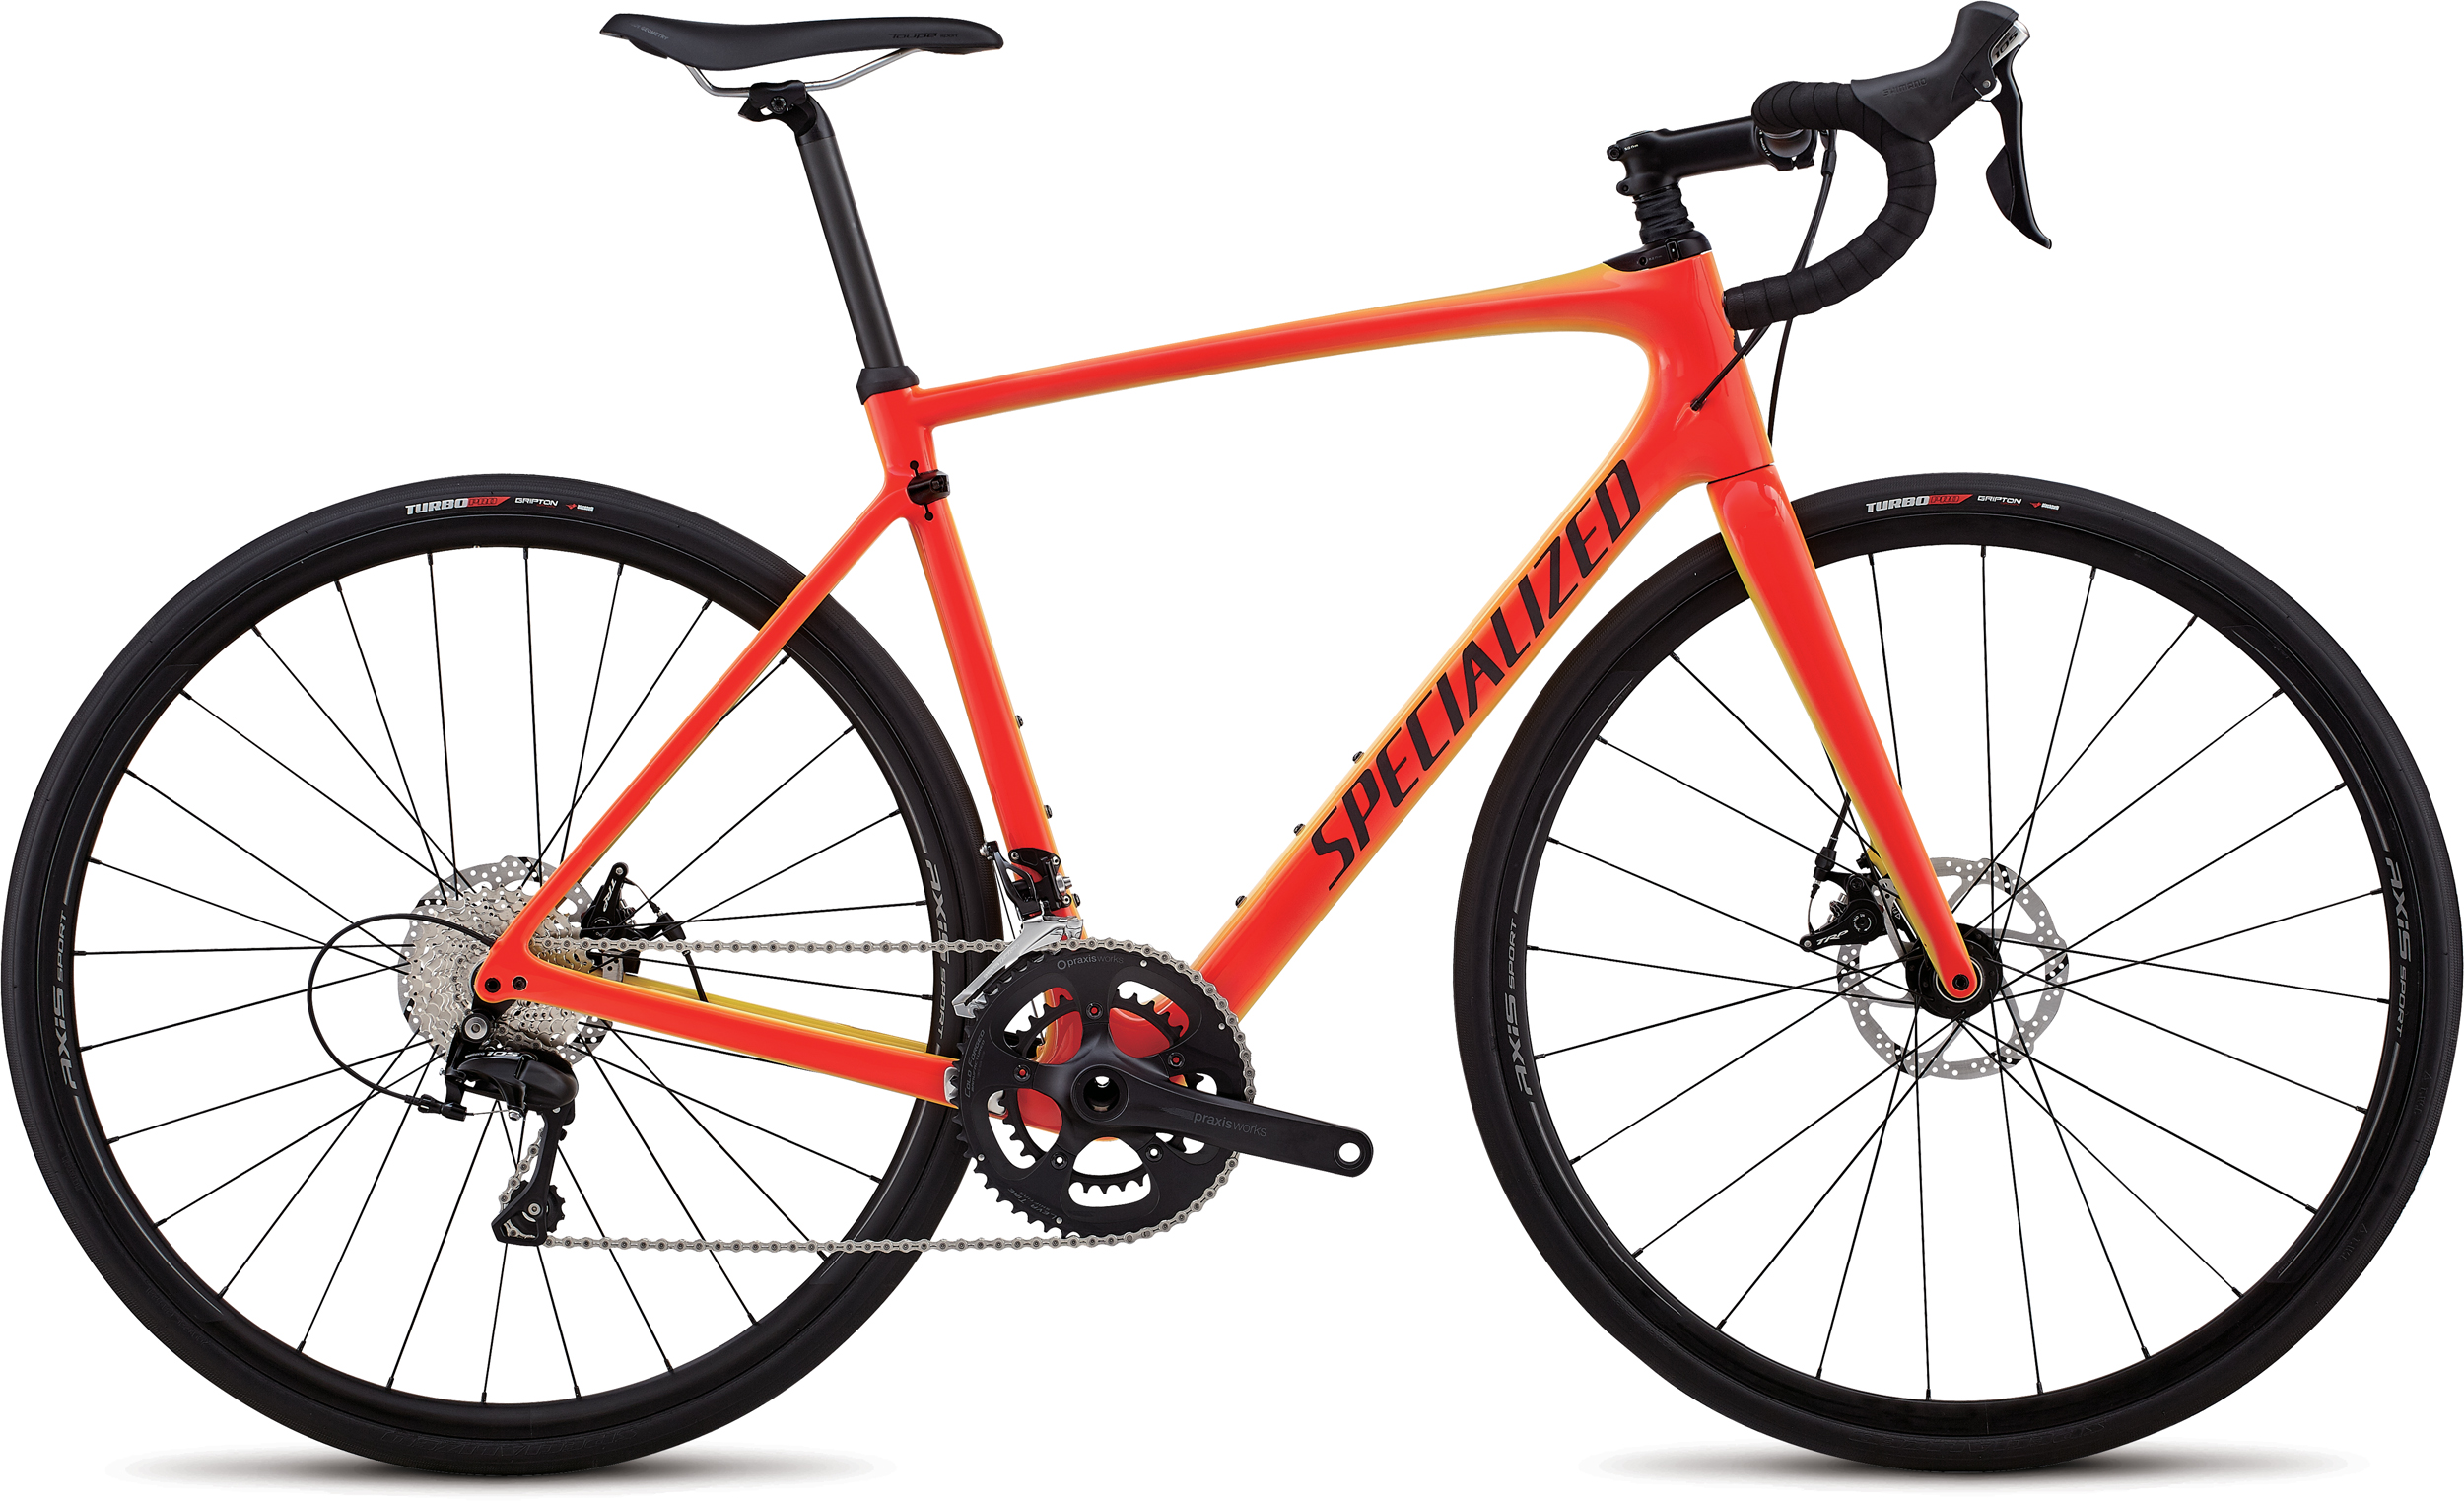 2018 Roubaix starts at $1899